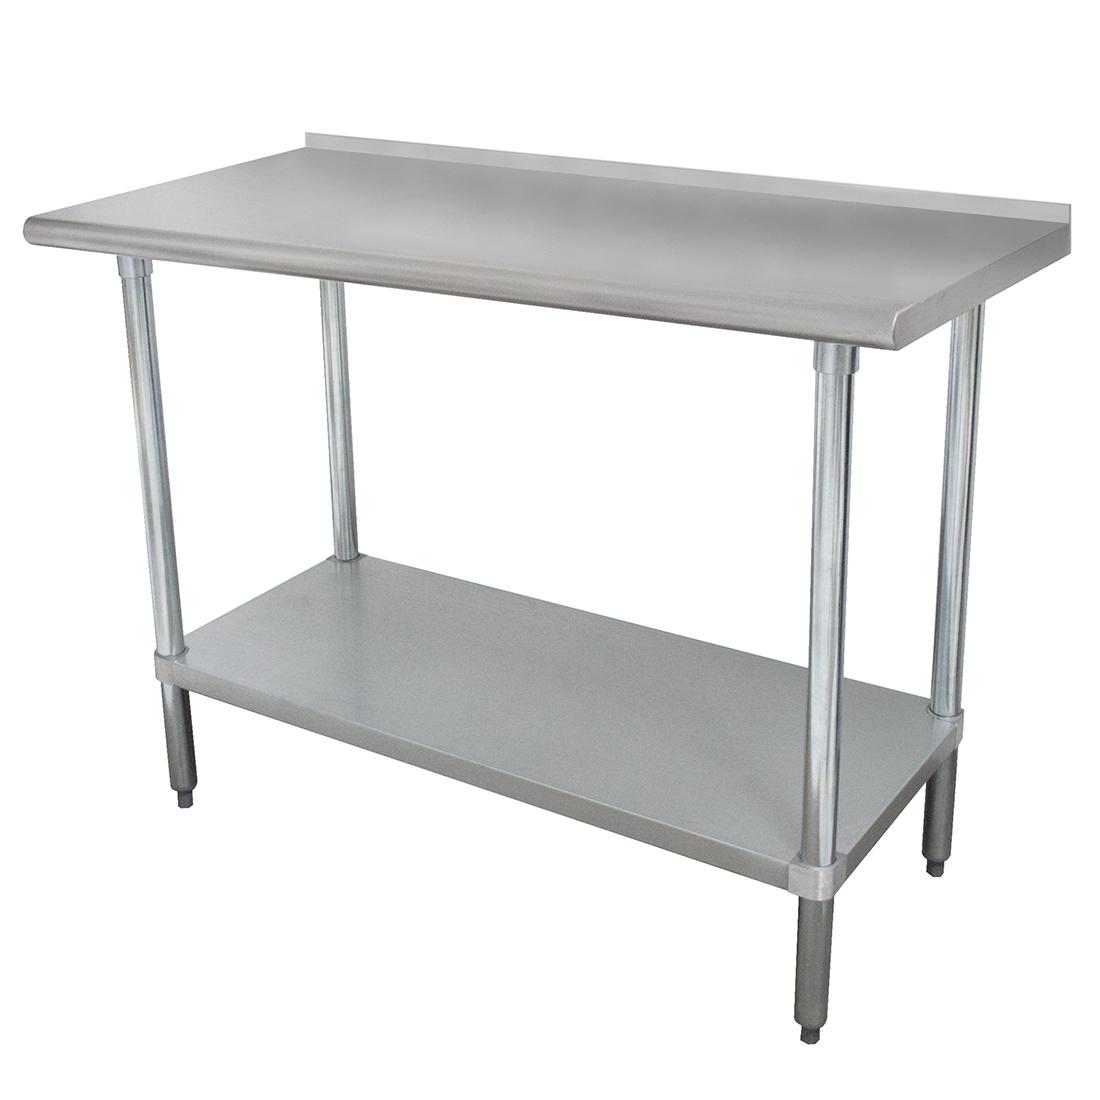 Advance Tabco FLG-2411 work table, 121